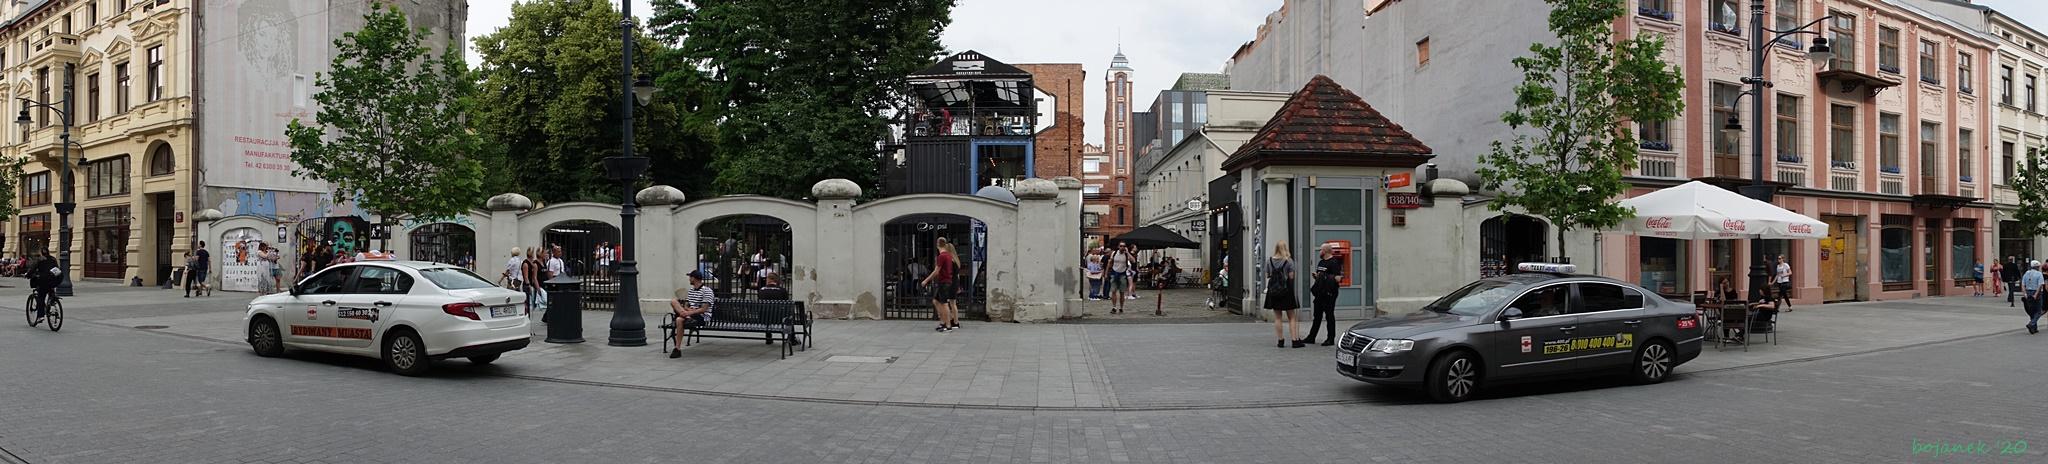 Piotrkowska 48